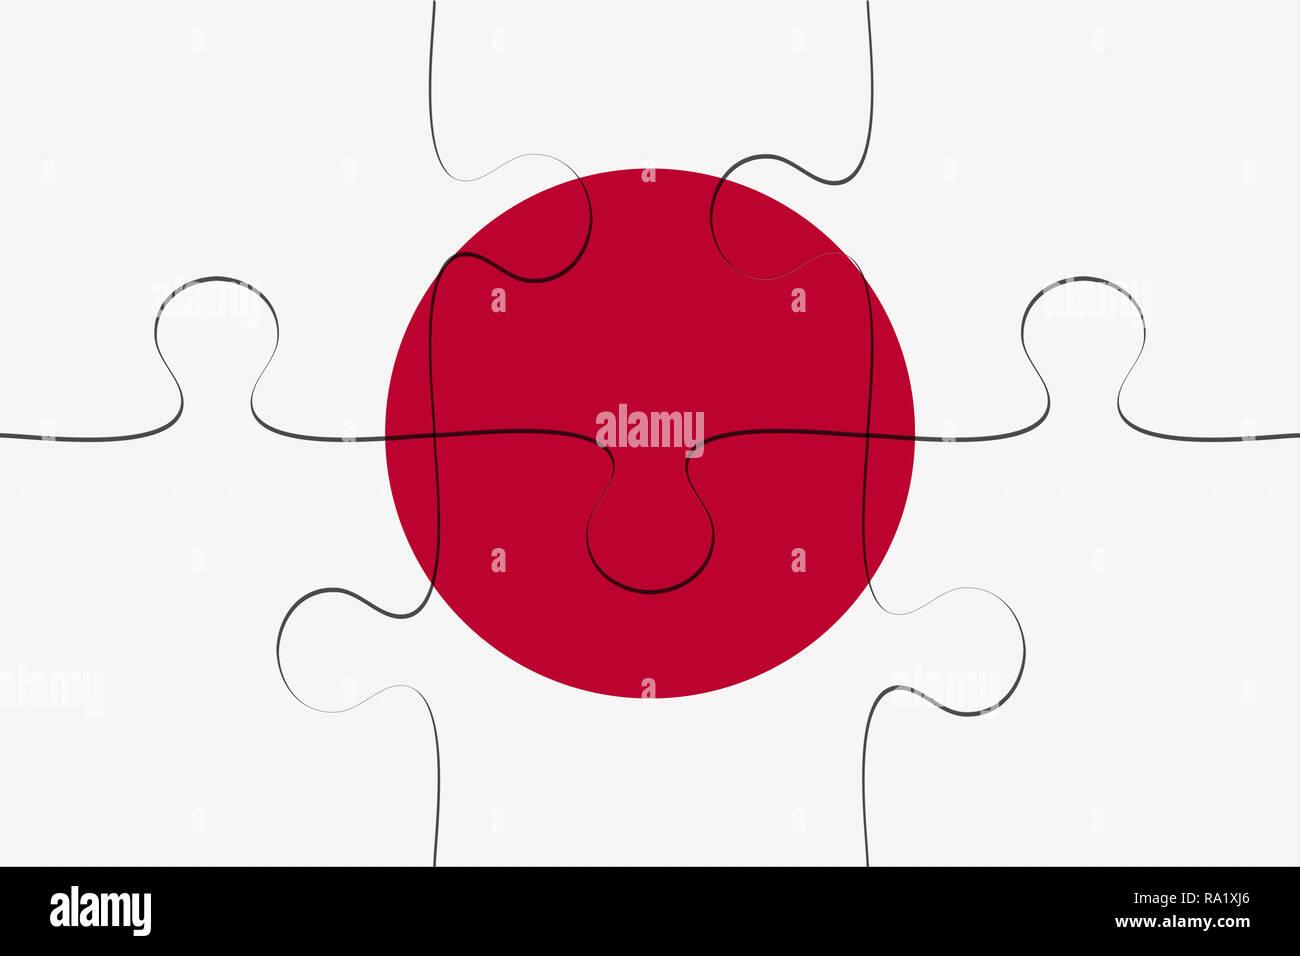 Japan Flag Jigsaw Puzzle, 3d illustration background Stock Photo